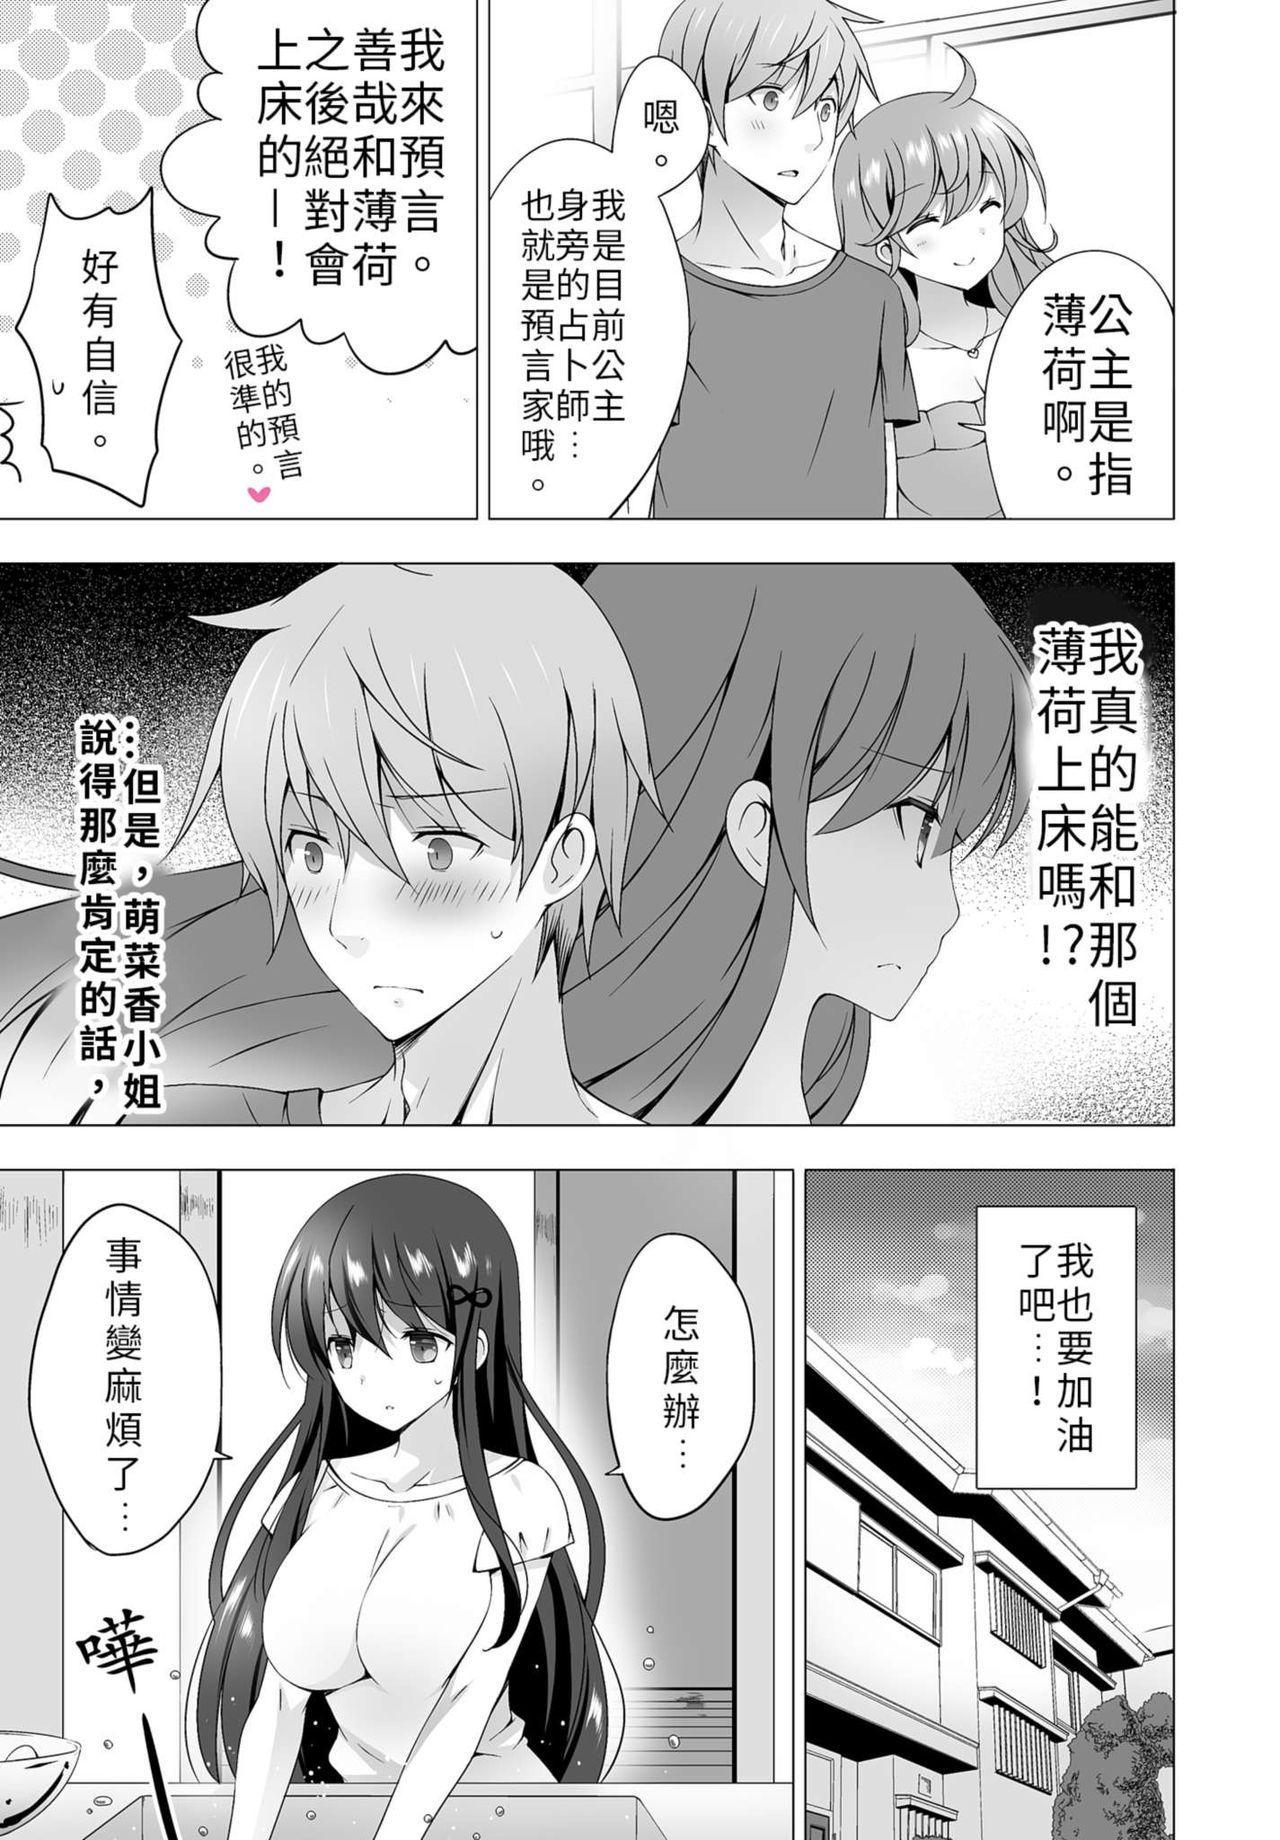 [vanilla] 4LDK Shimai Tsuki ~Muichimon OK, Tadashi Doutei ni Kagiru | 四房一衛一廳附姊妹 ~身無分文OK,但僅限處男~ Ch. 2 [Chinese] 6